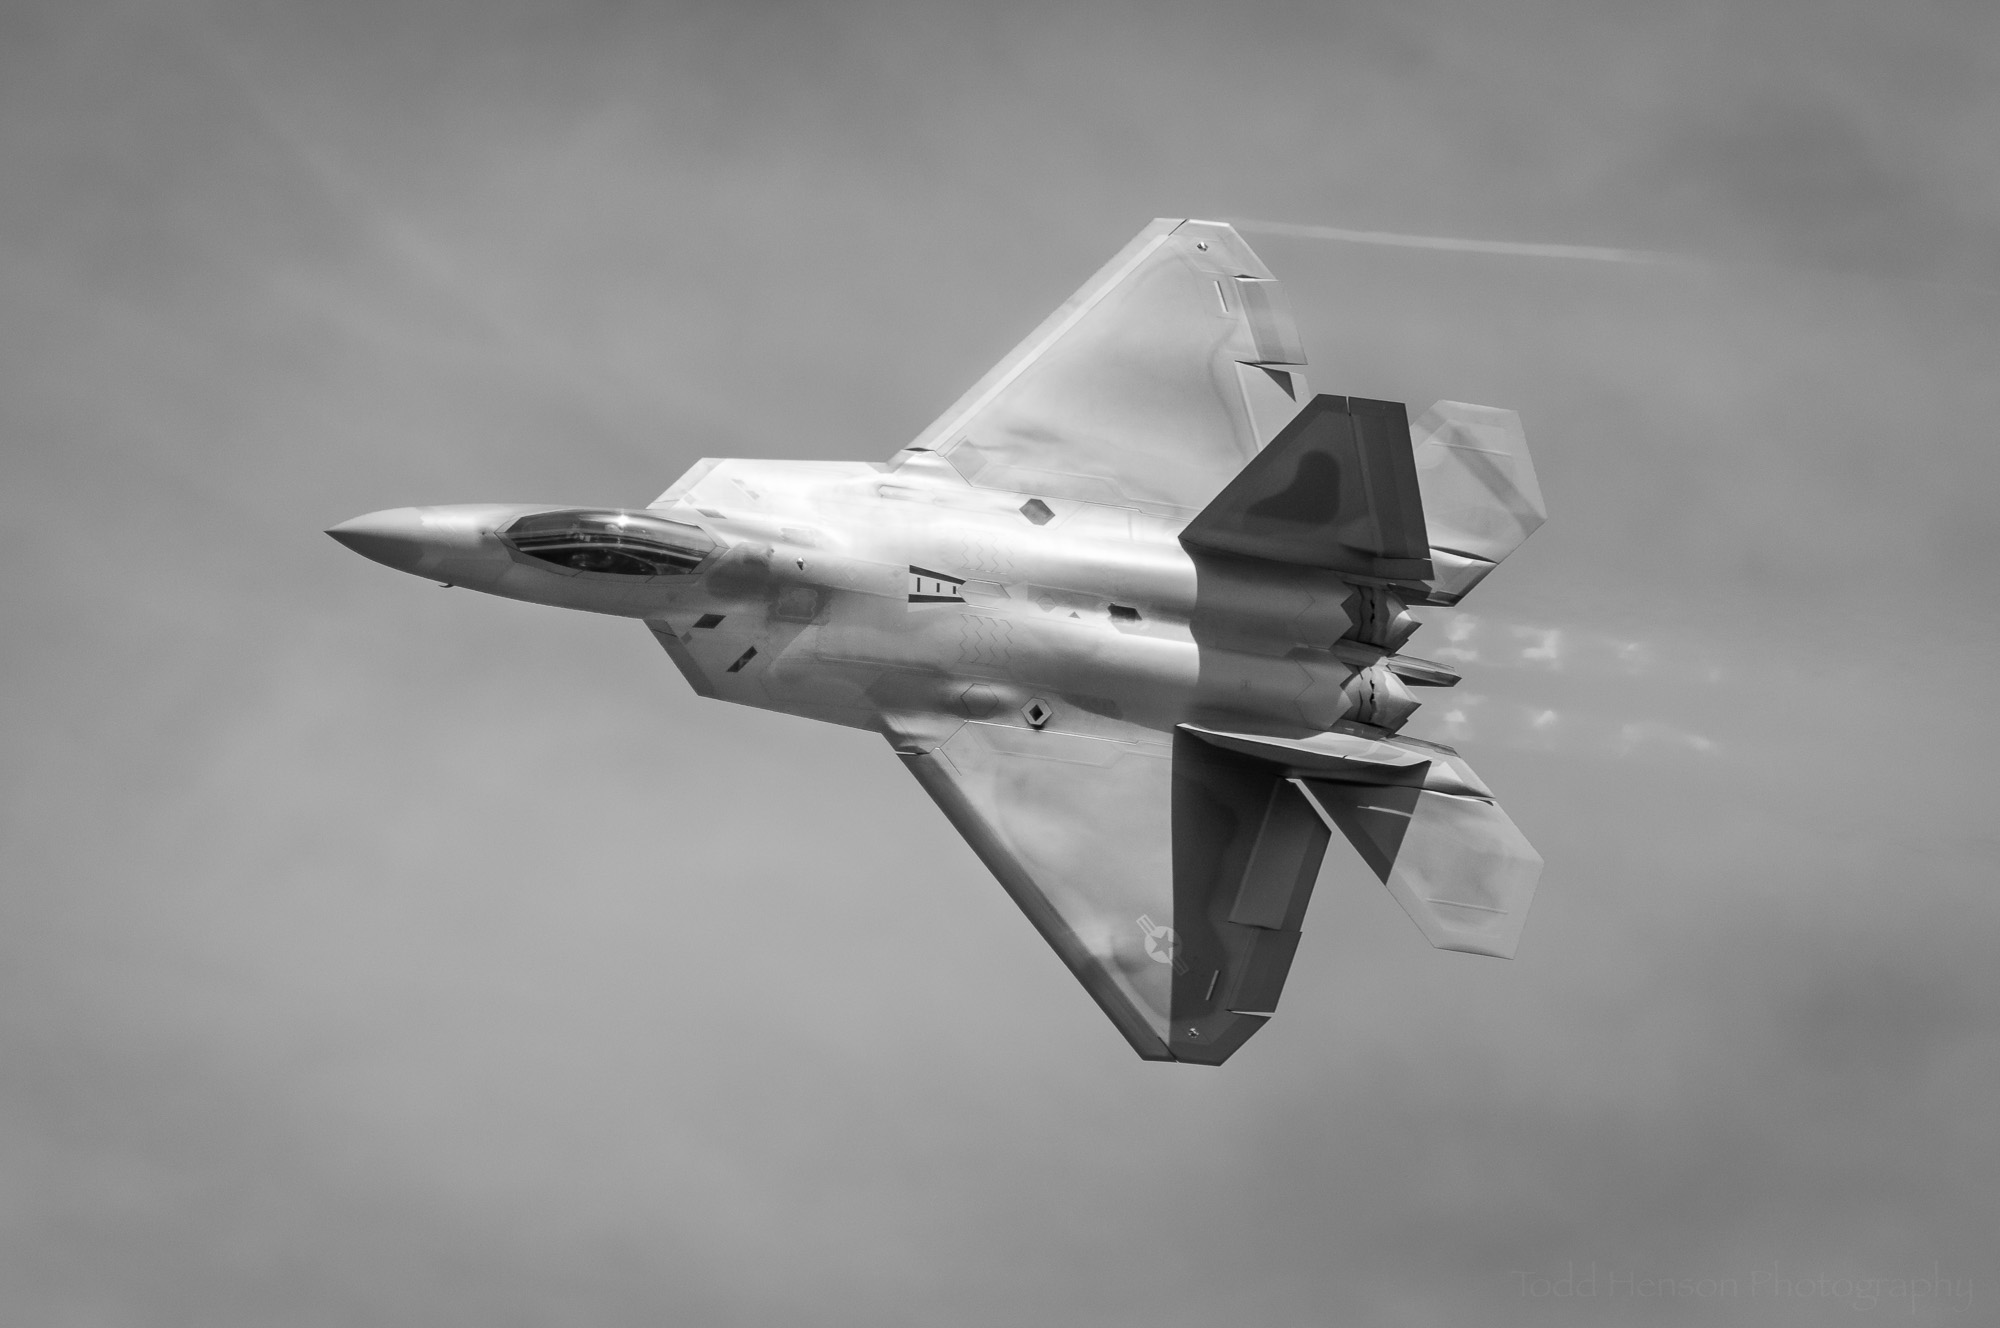 Raptor Flyby #1: USAF F-22 Raptor performing a flyby.